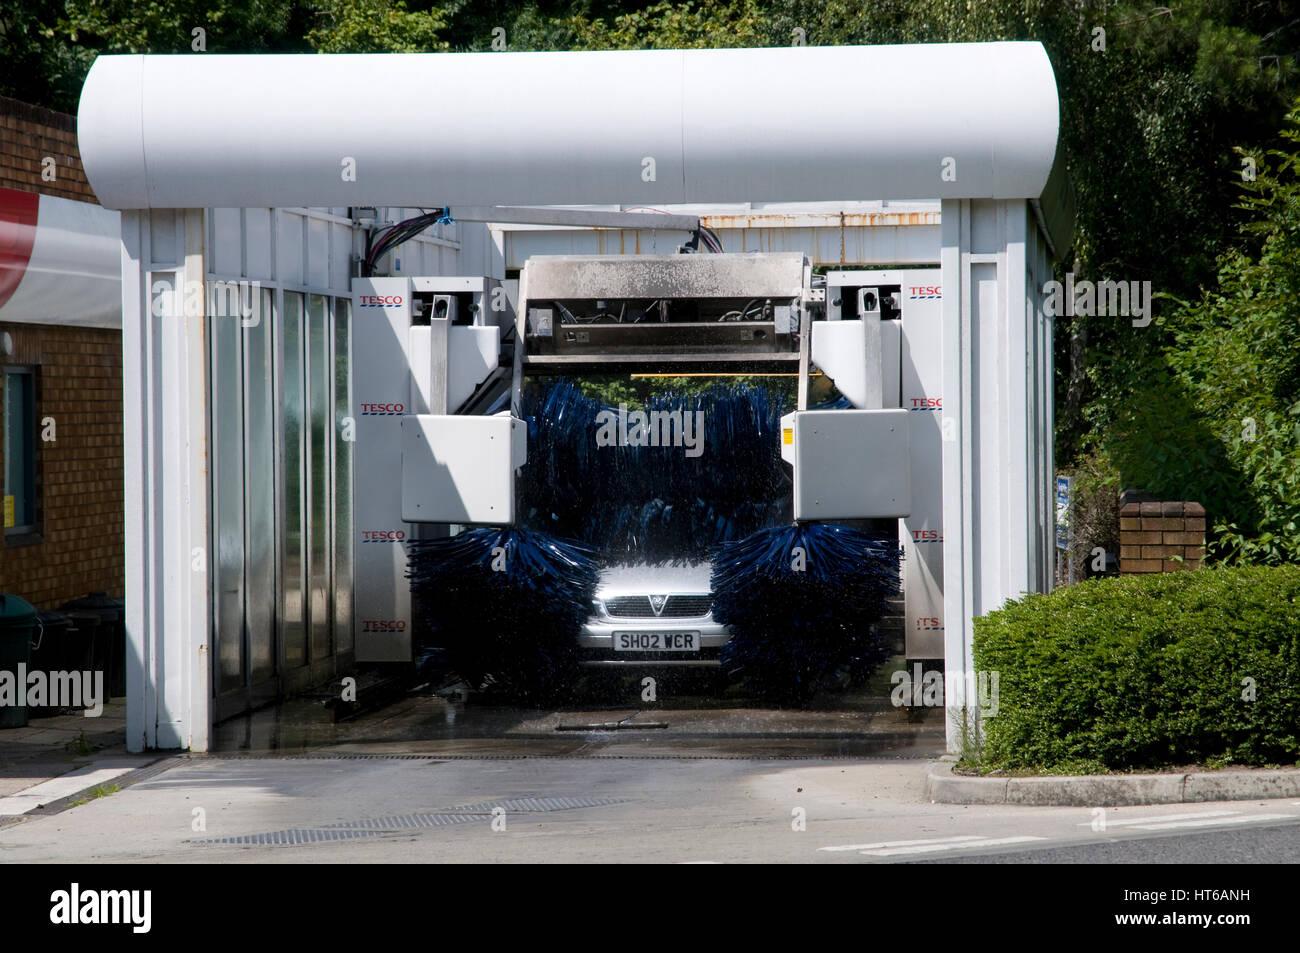 Automated car wash 2011 - Stock Image